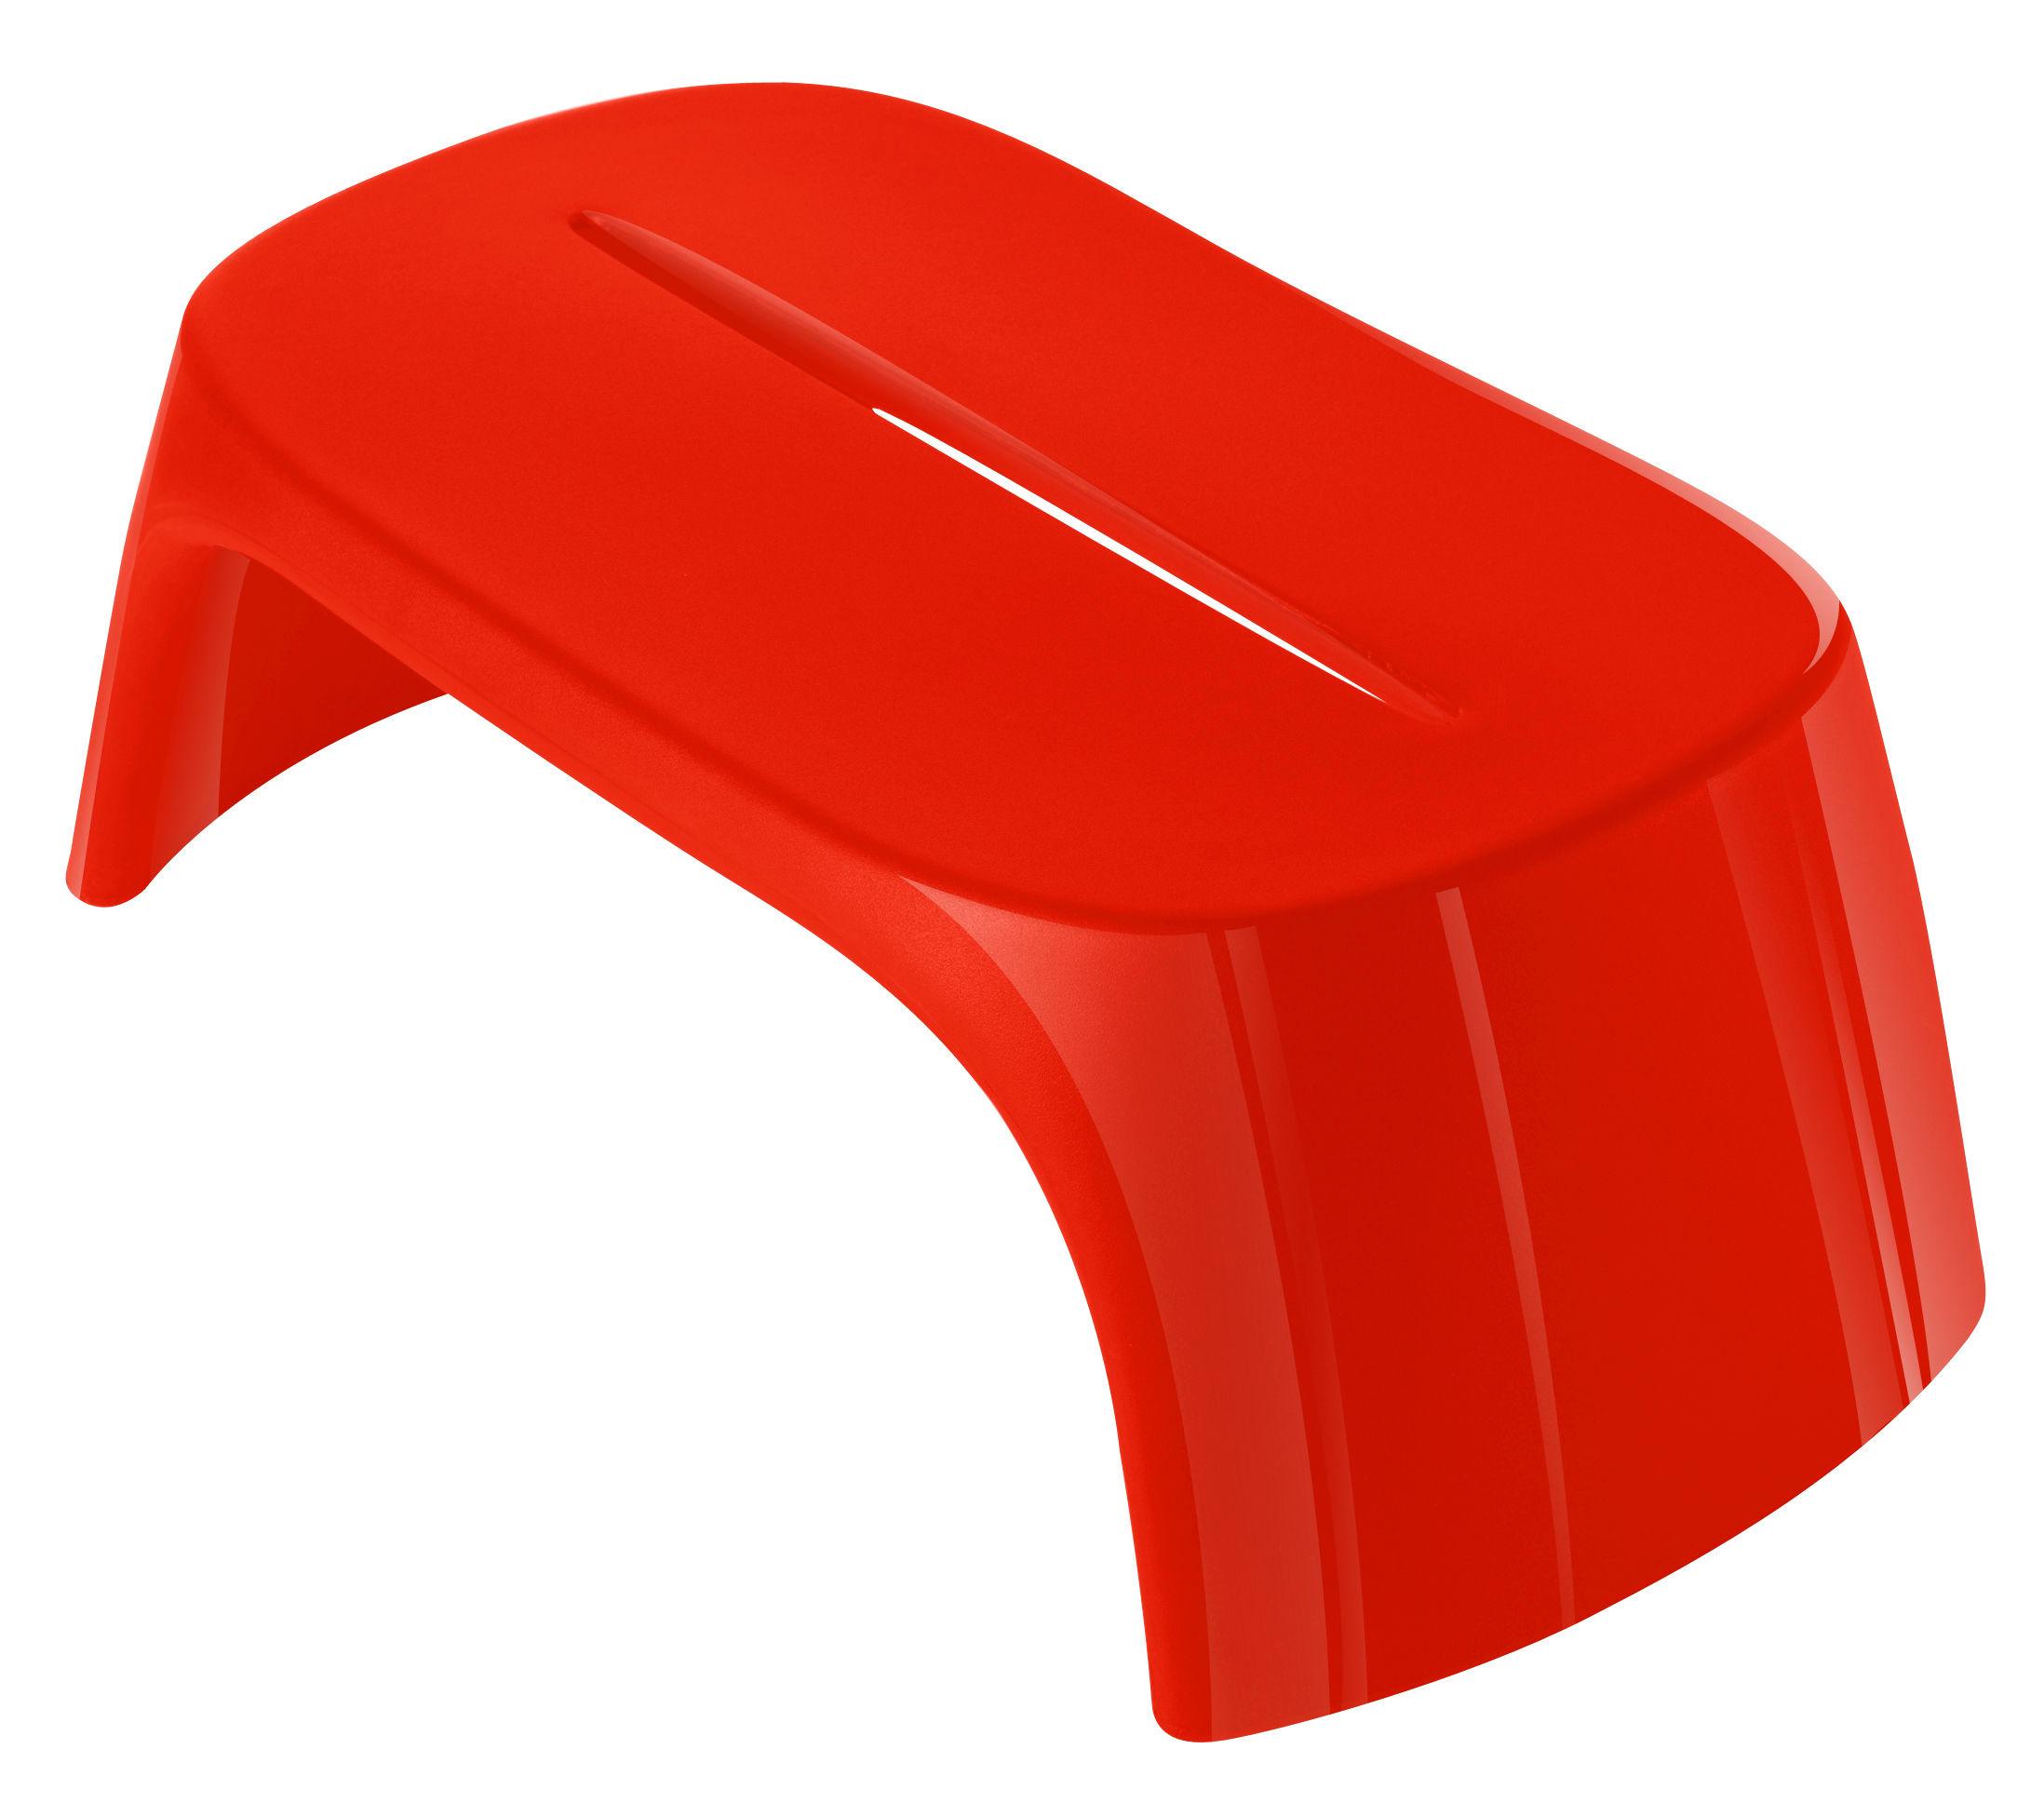 Möbel - Couchtische - Amélie Couchtisch / Bank - lackiert - Slide - Rot lackiert - lackiertes Polyäthylen